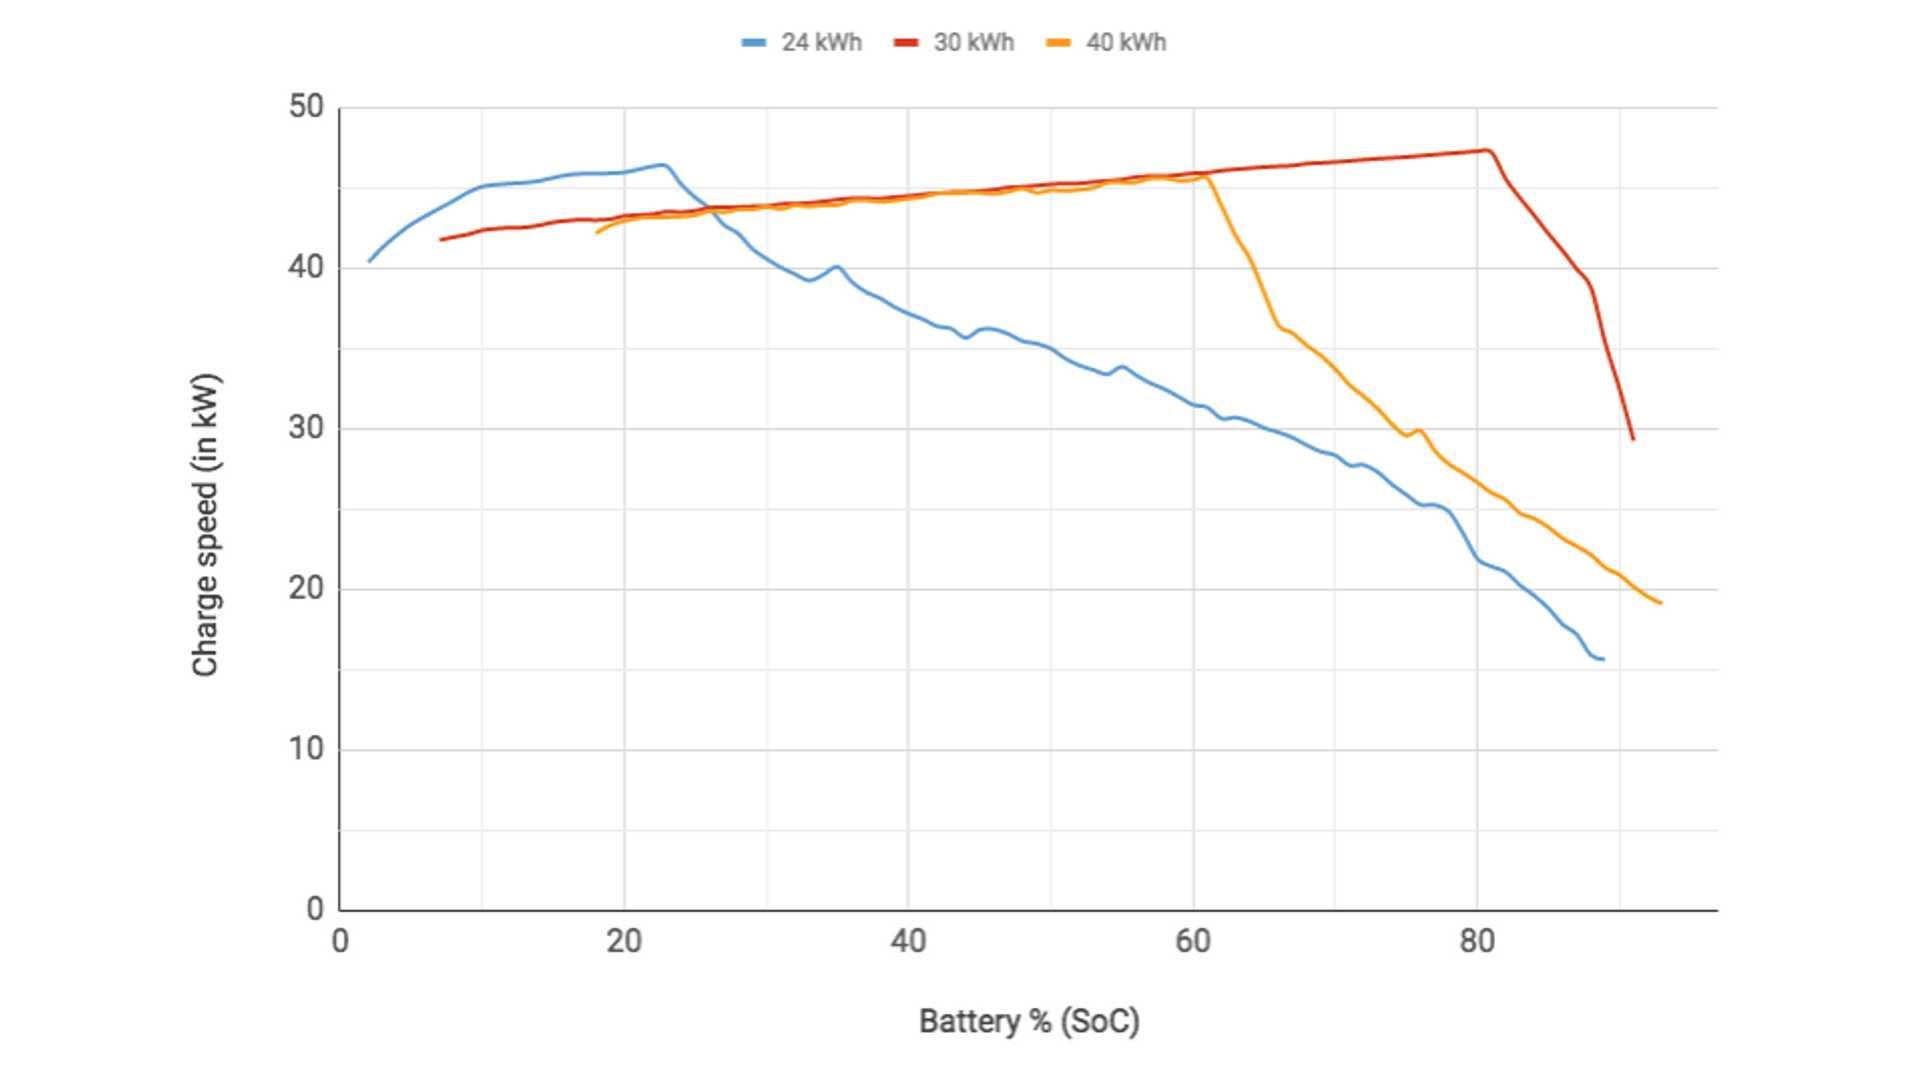 Заряд батареи в % против скорости зарядки. Мой Лиф - голубая линия.